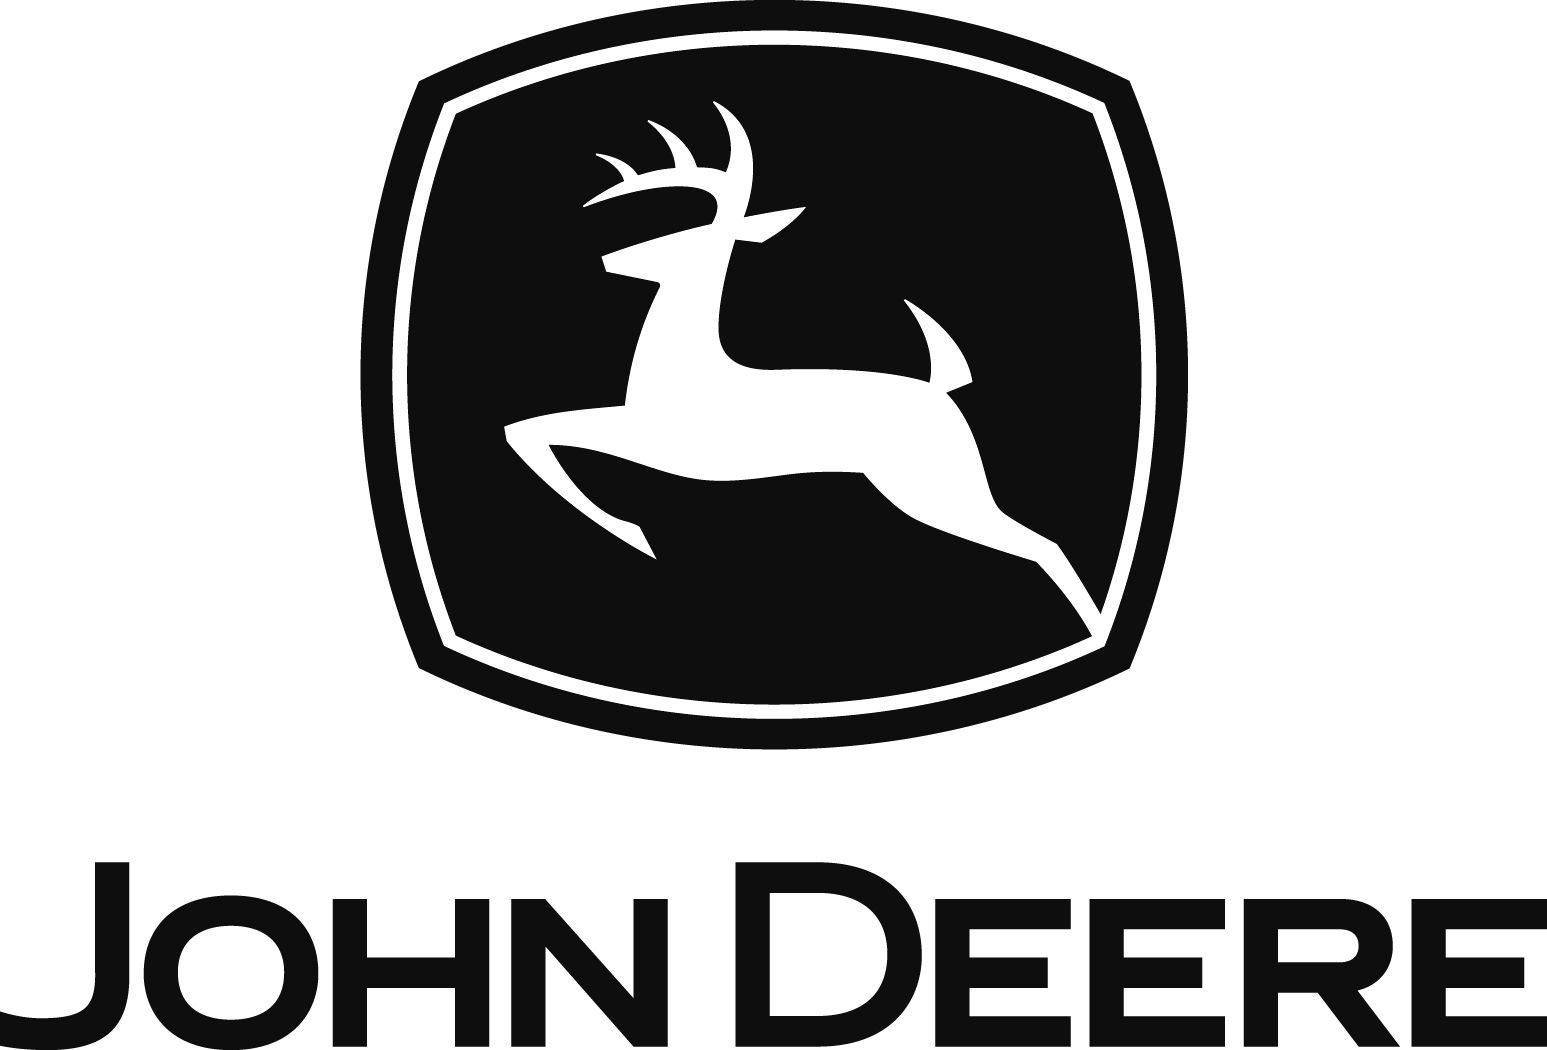 John Deere Logo Wall Decal  Home Decor Vinyl Company Machines Equipment